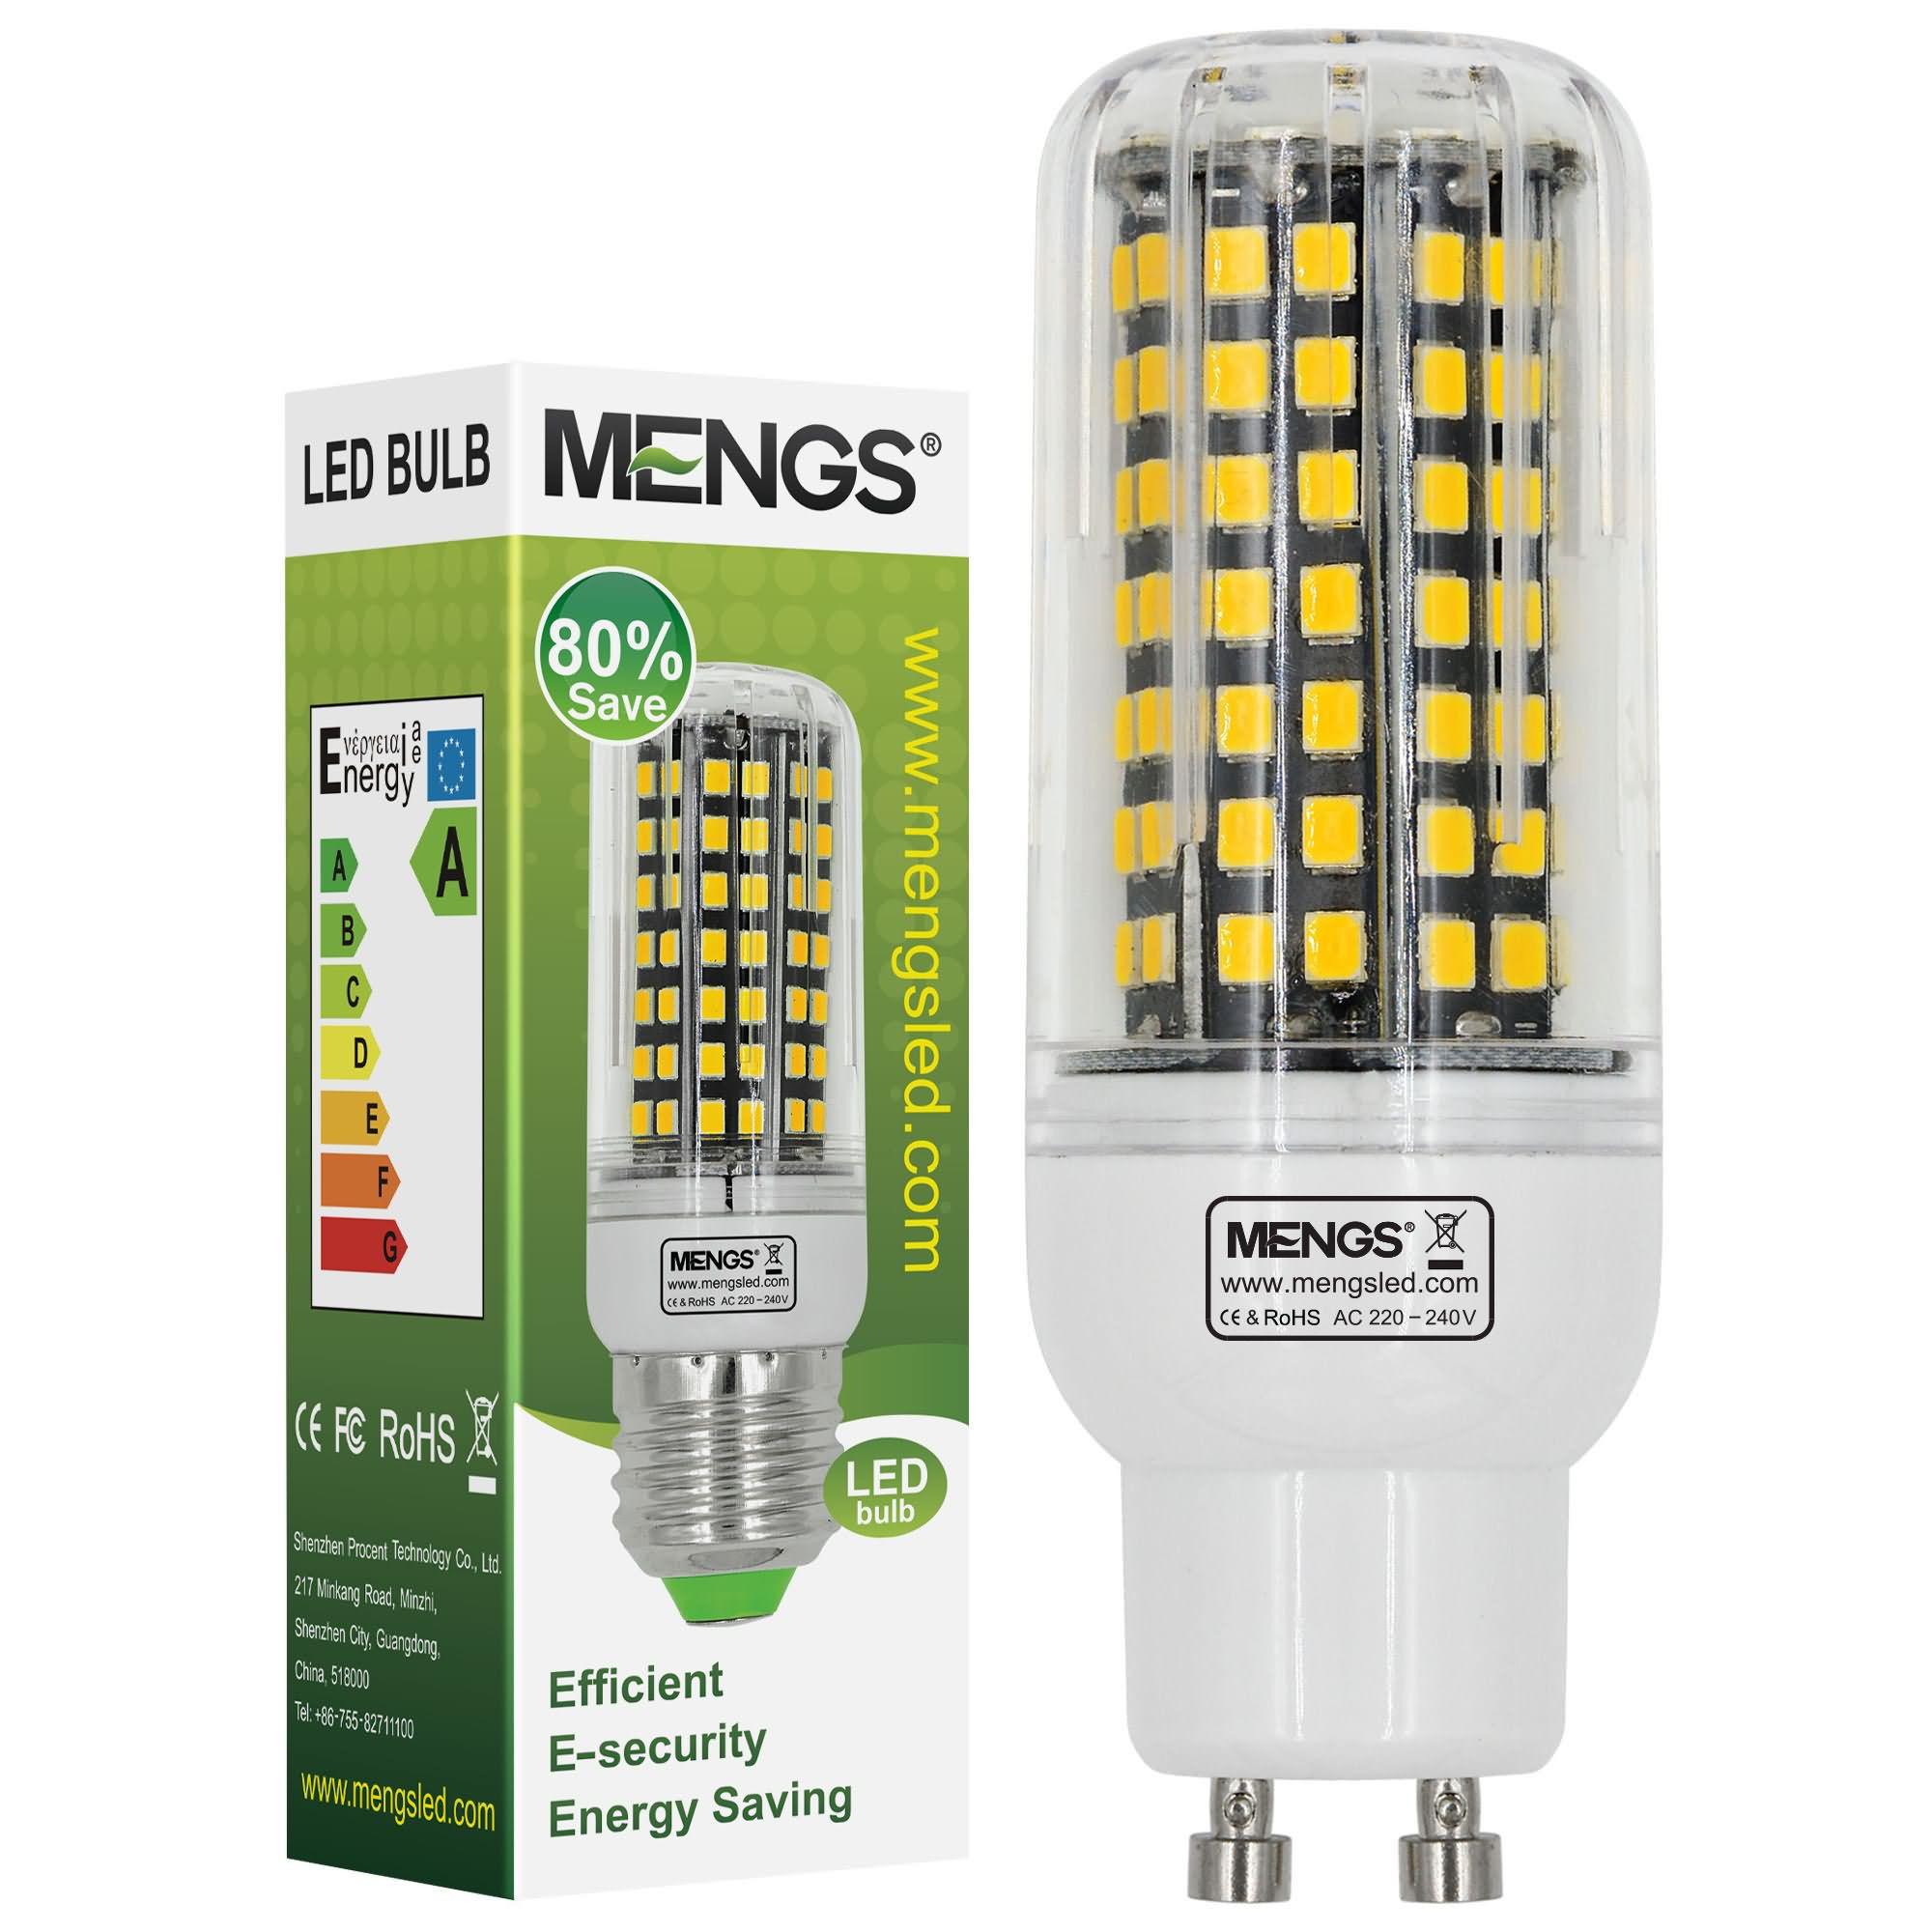 MENGS® GU10 10W LED Corn Light 112x 2835 SMD LED Bulb Lamp With Aluminum Plate In Warm White Energy-Saving Light